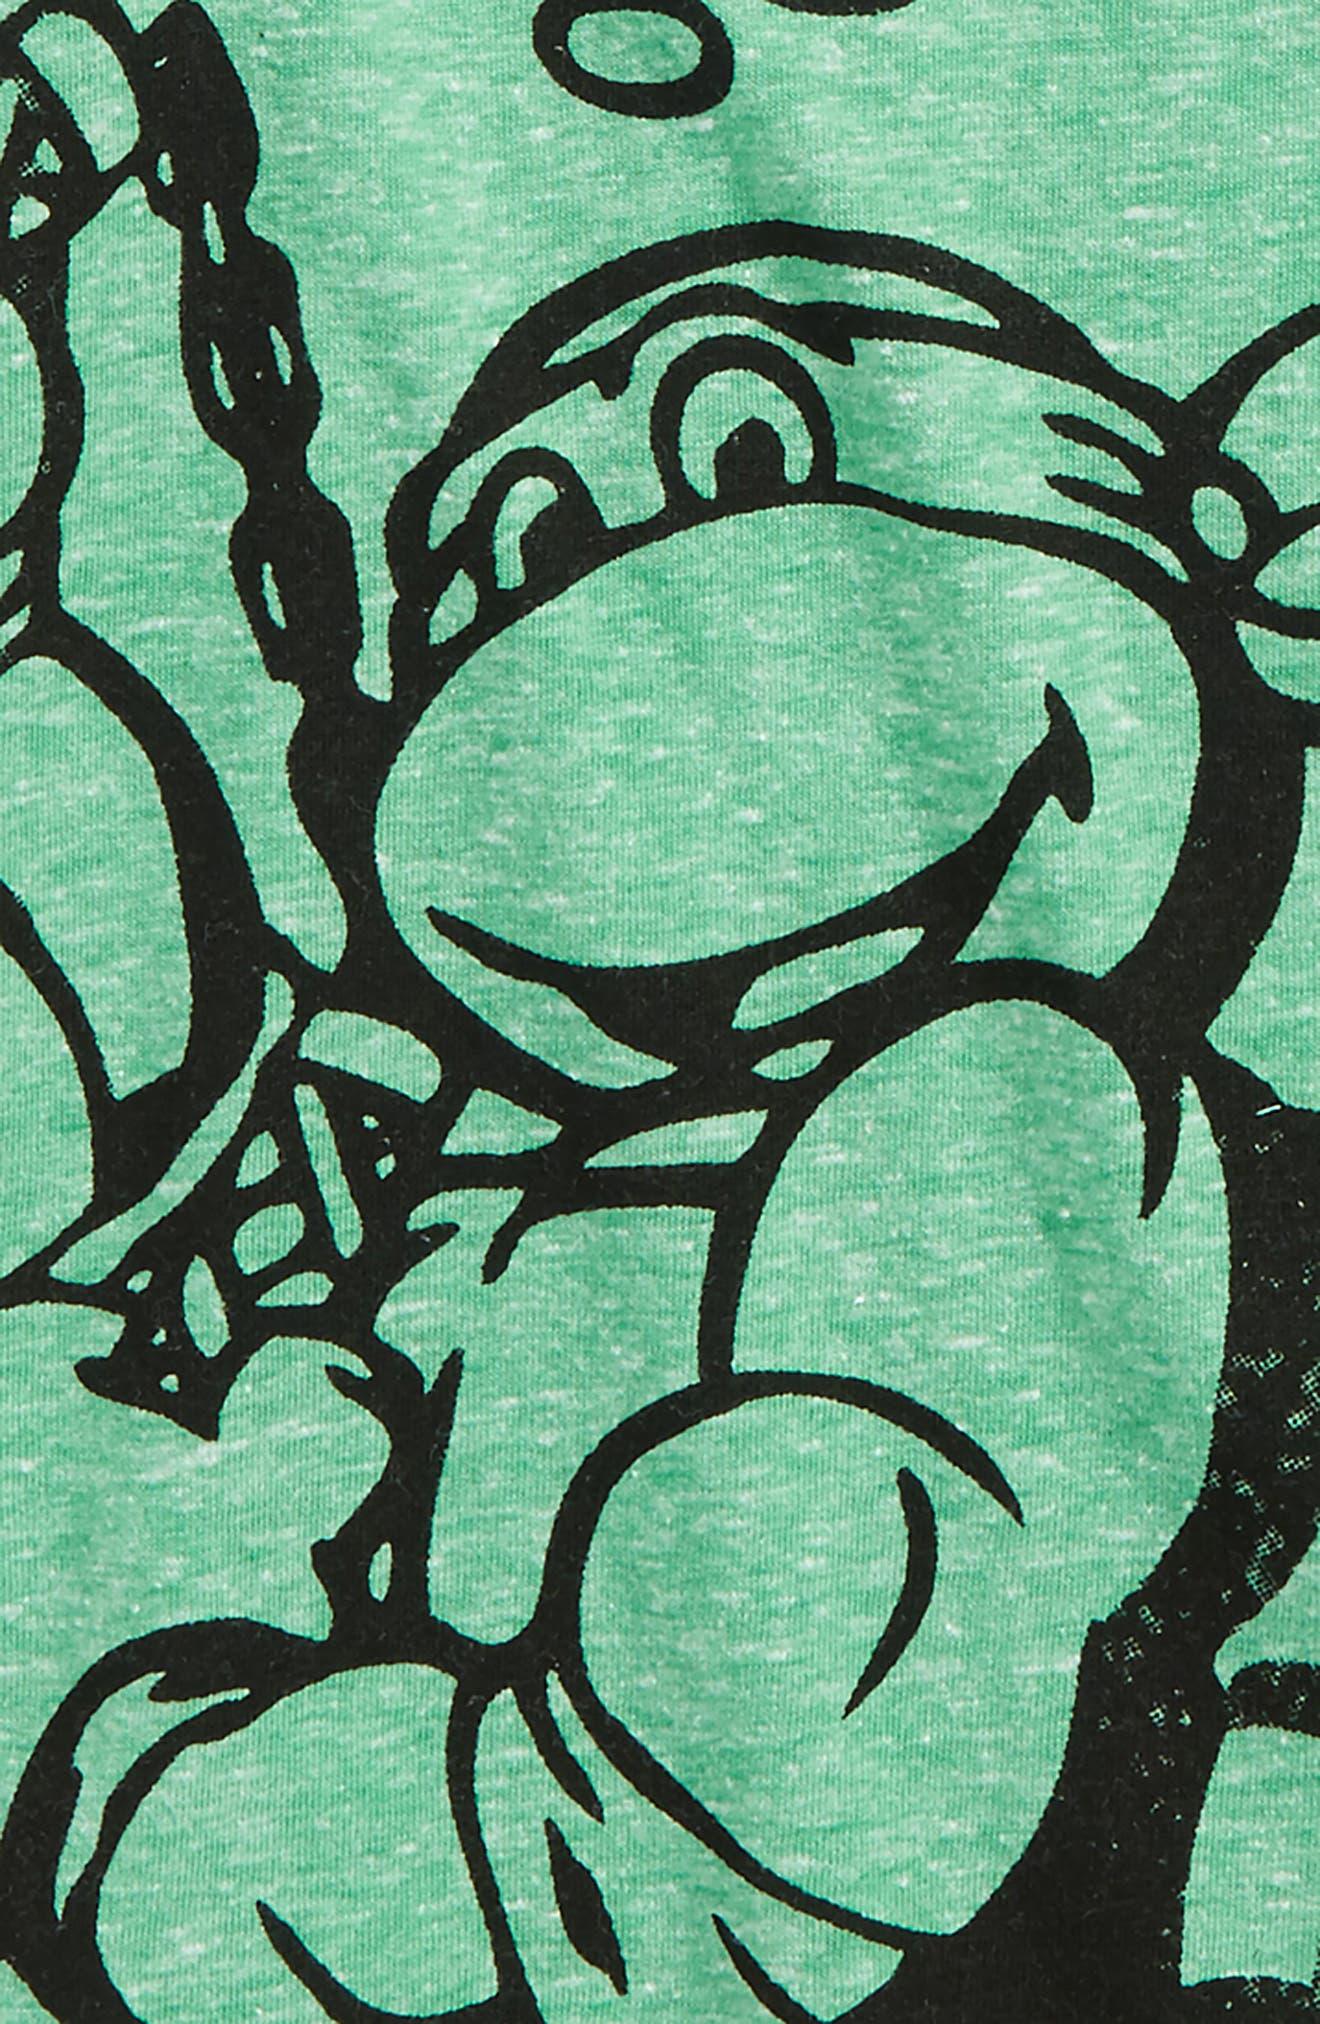 TMNT - Tough as a Turtle Graphic T-Shirt,                             Alternate thumbnail 2, color,                             300